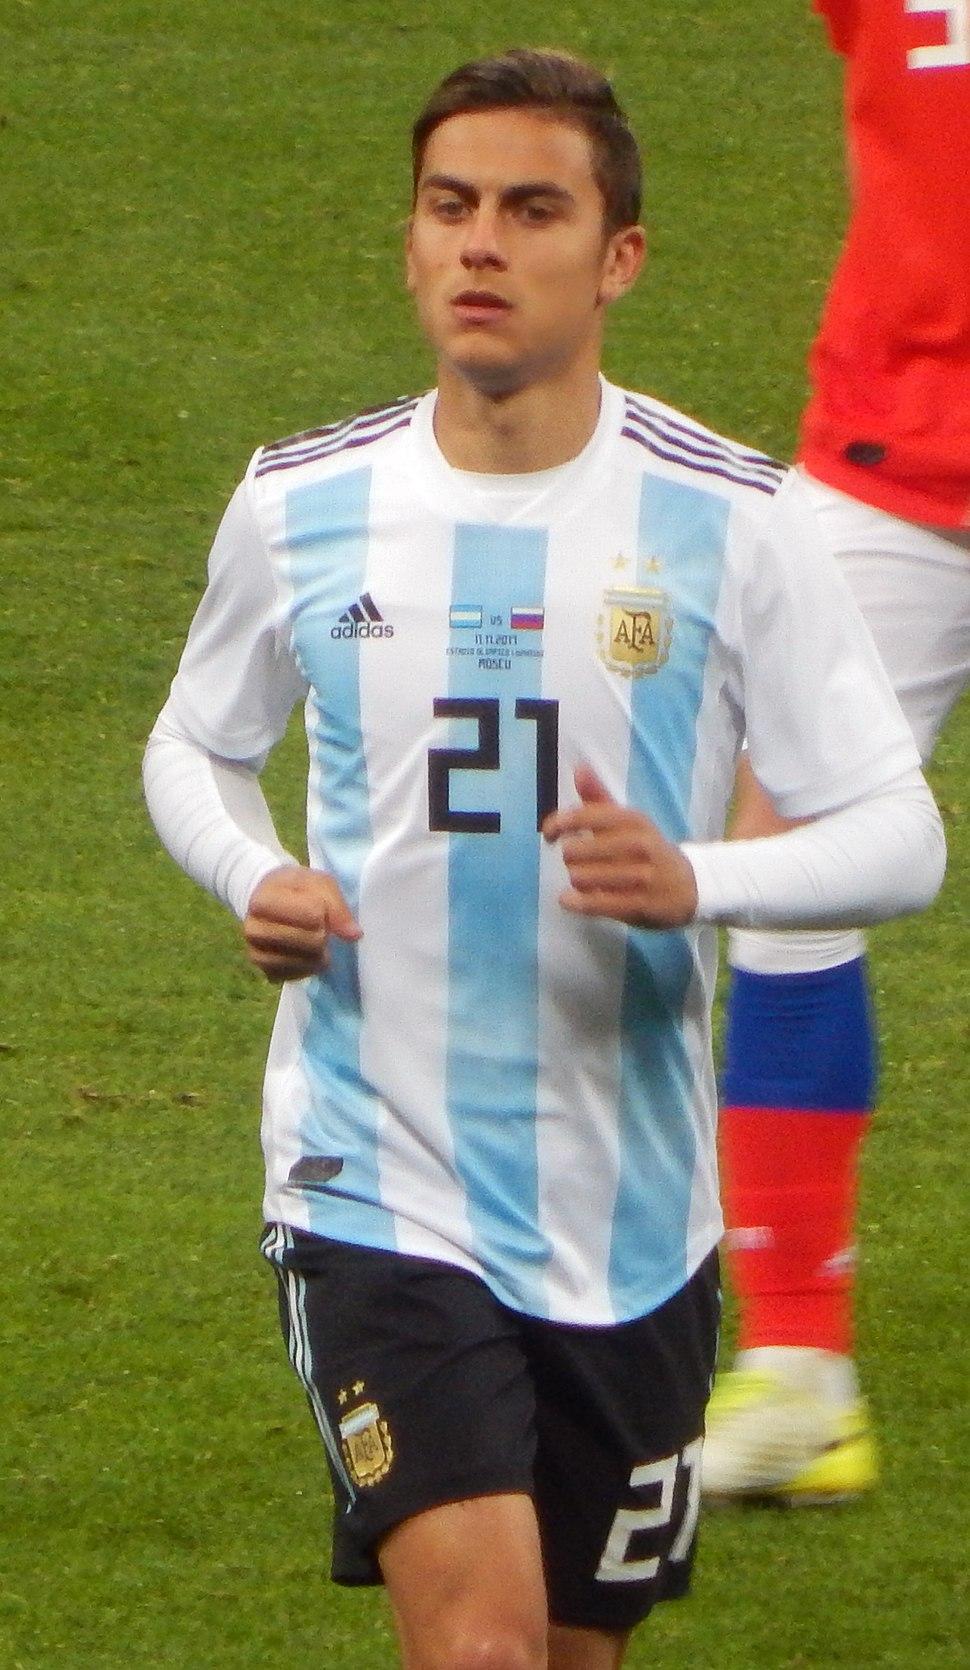 2017 FRIENDLY MATCH RUSSIA v ARGENTINA - Paulo Dybala 01